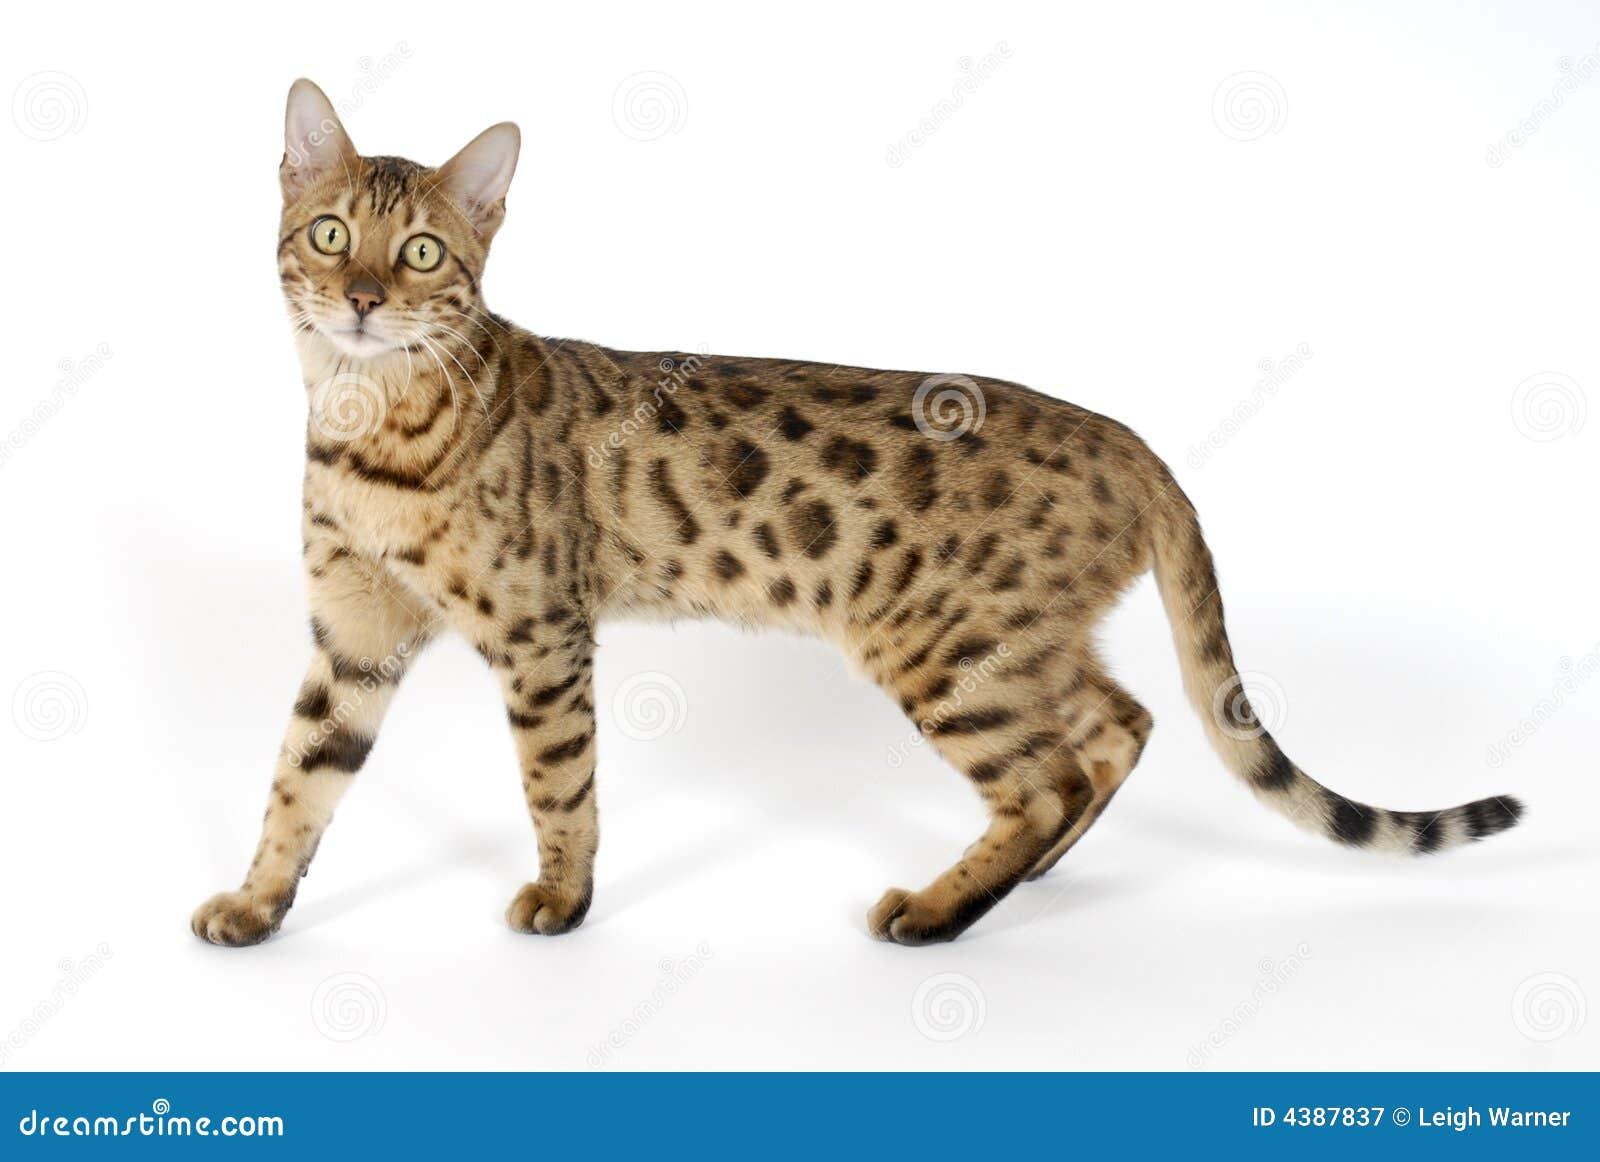 Beautiful Brown Cat Breeds